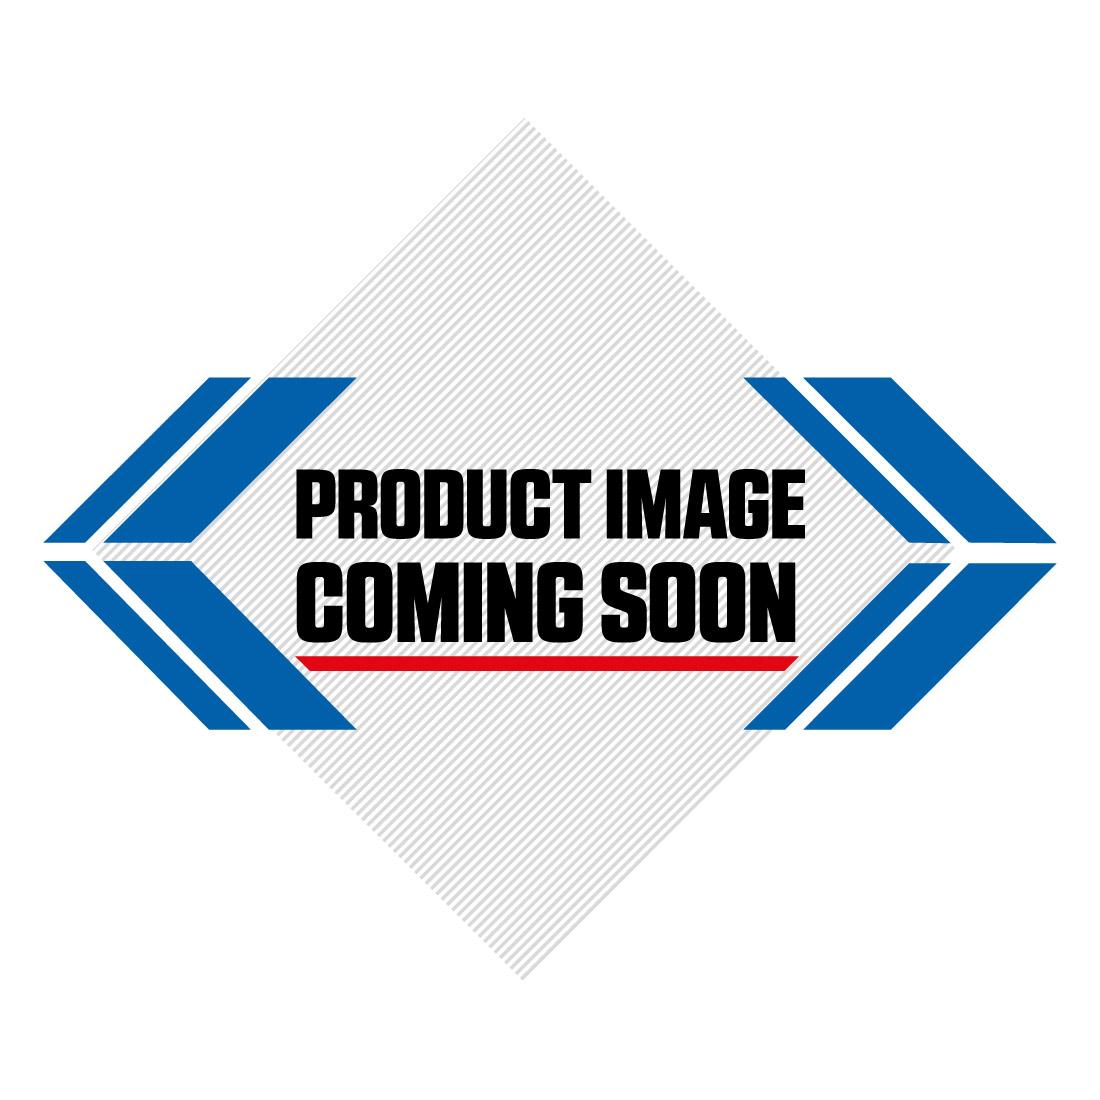 Suzuki Plastic Kit  RM 125 250 (99-00) Black Image-1>